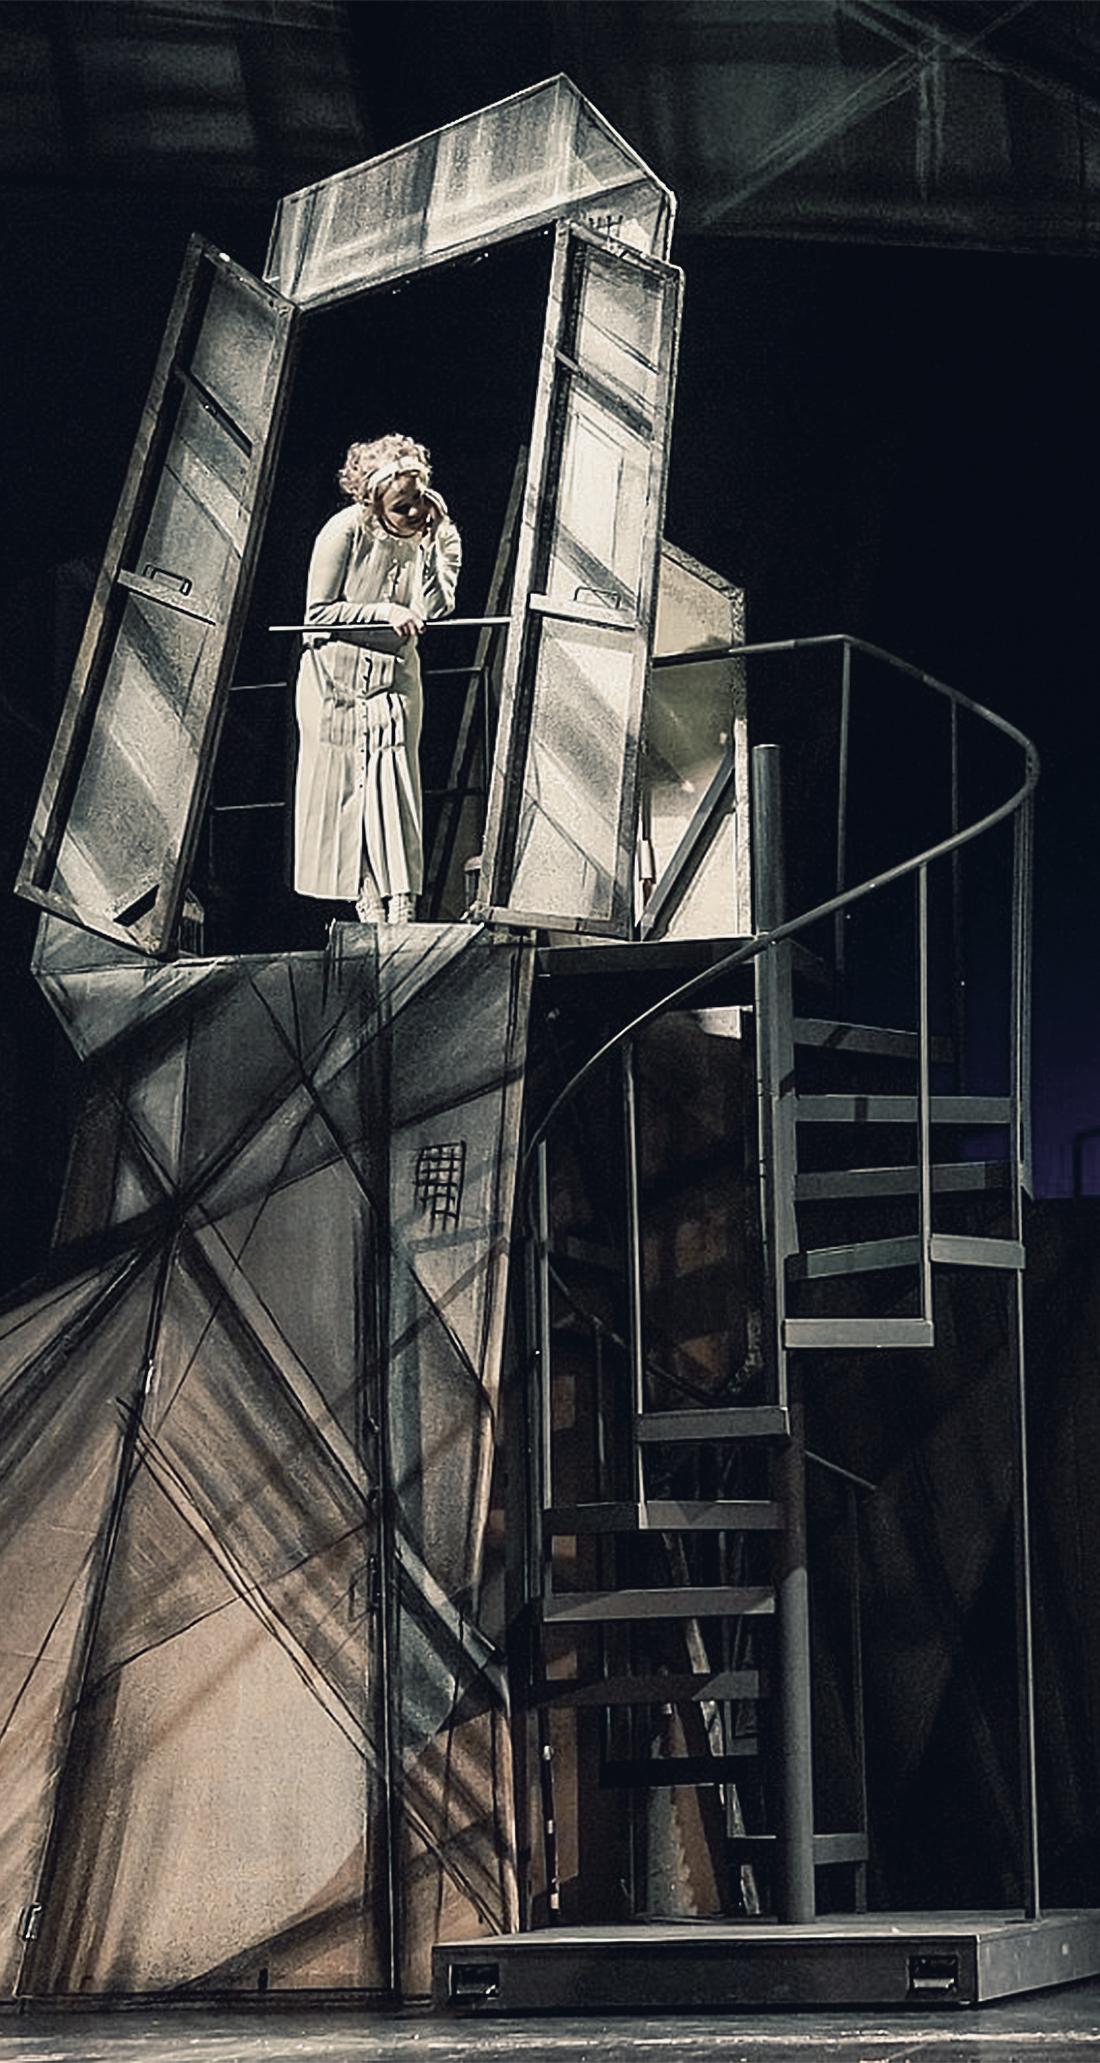 studio kudlich stage design for sweeney todd